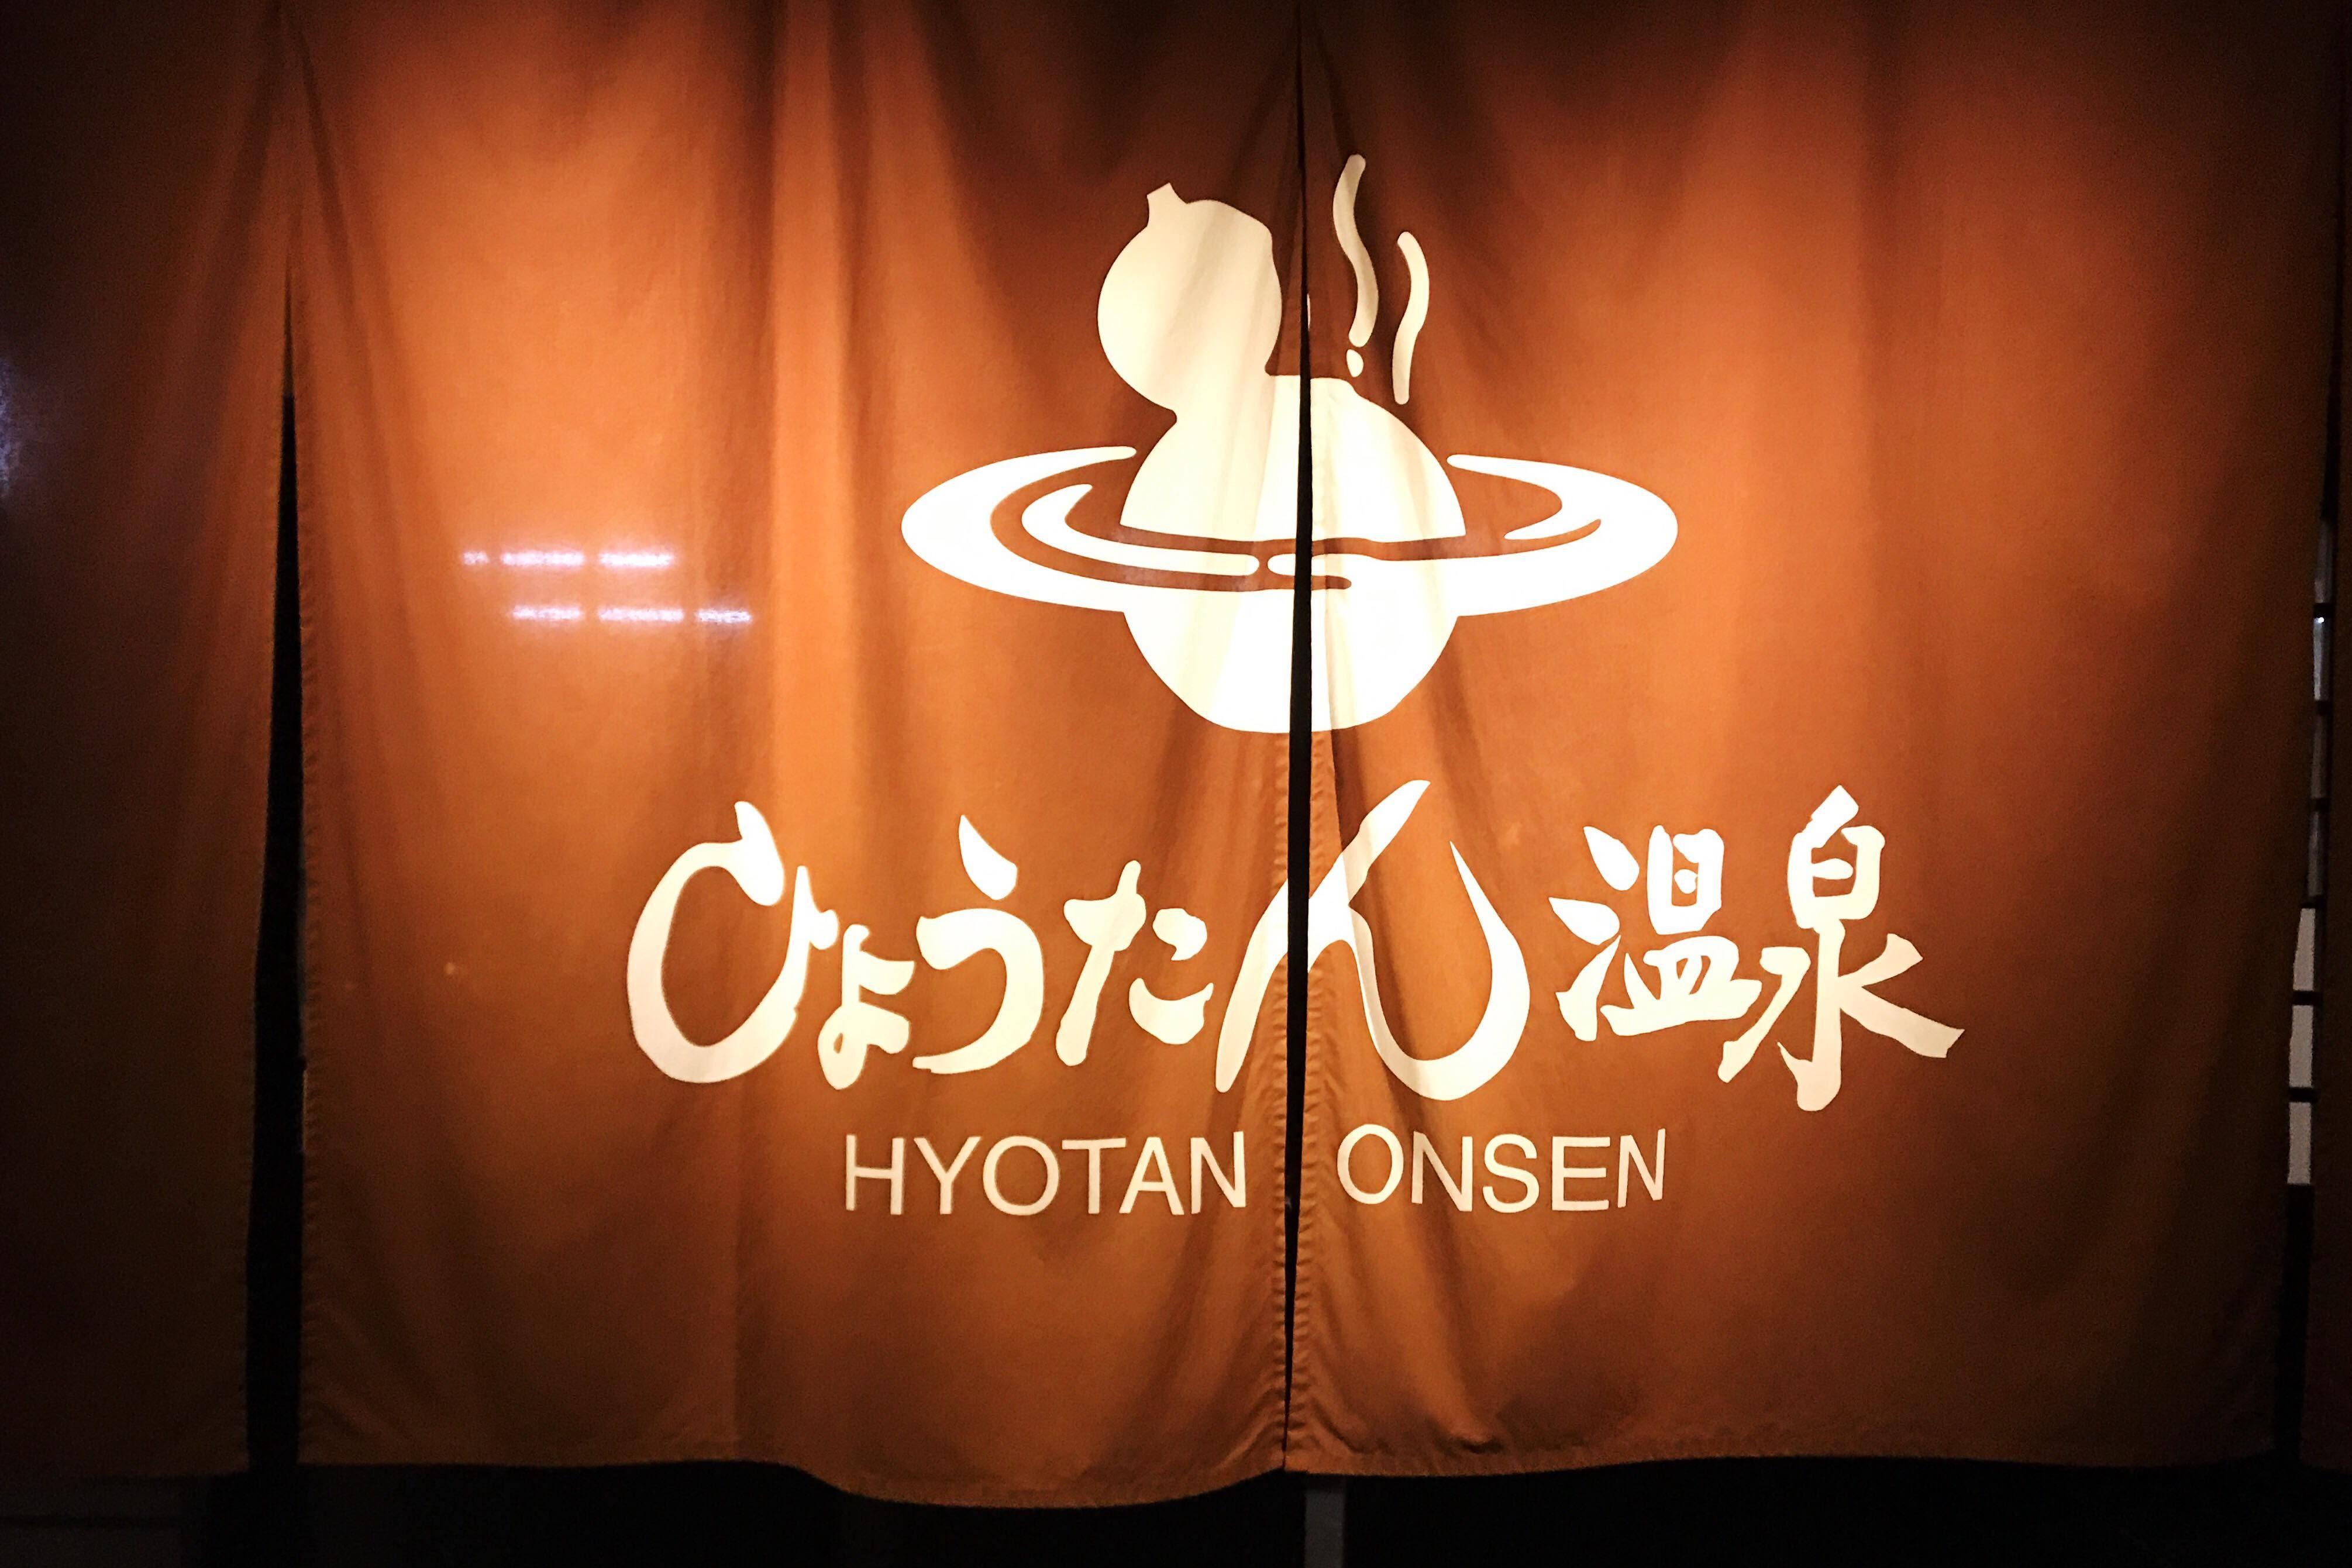 Bathing in Hyotan Onsen, Japan's only Michelin three-star onsen